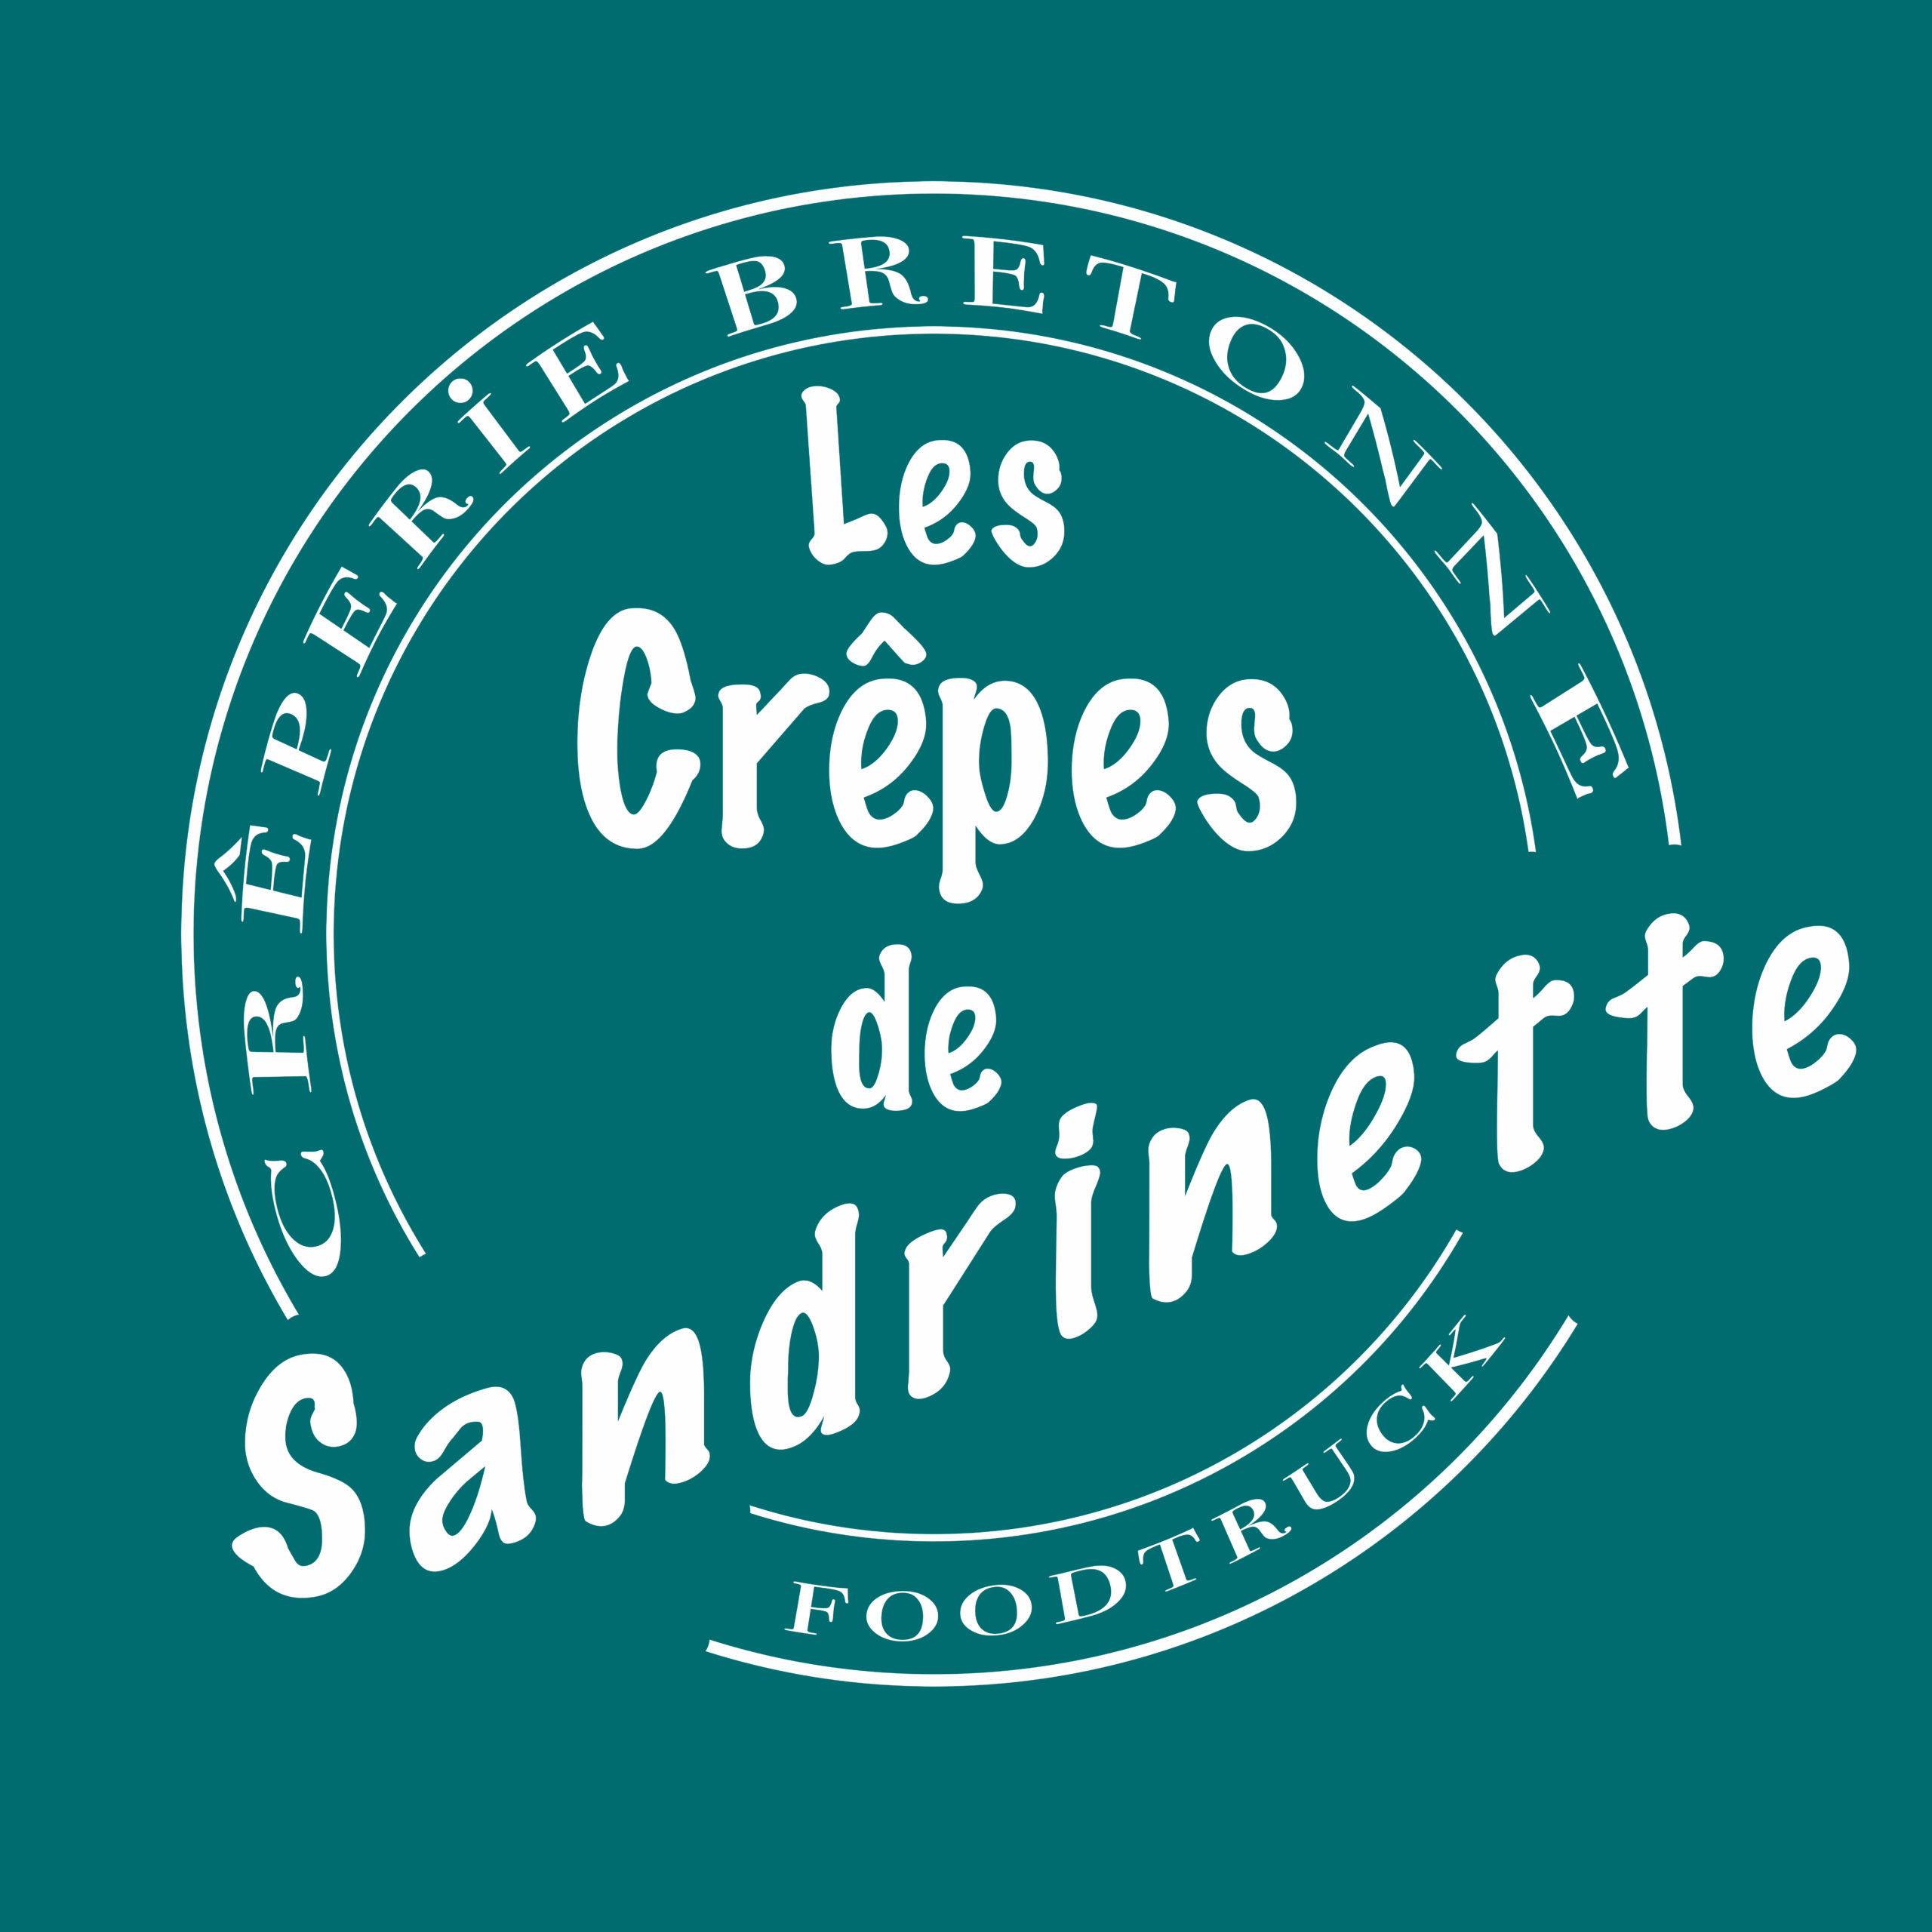 Les Crêpes de Sandrinette